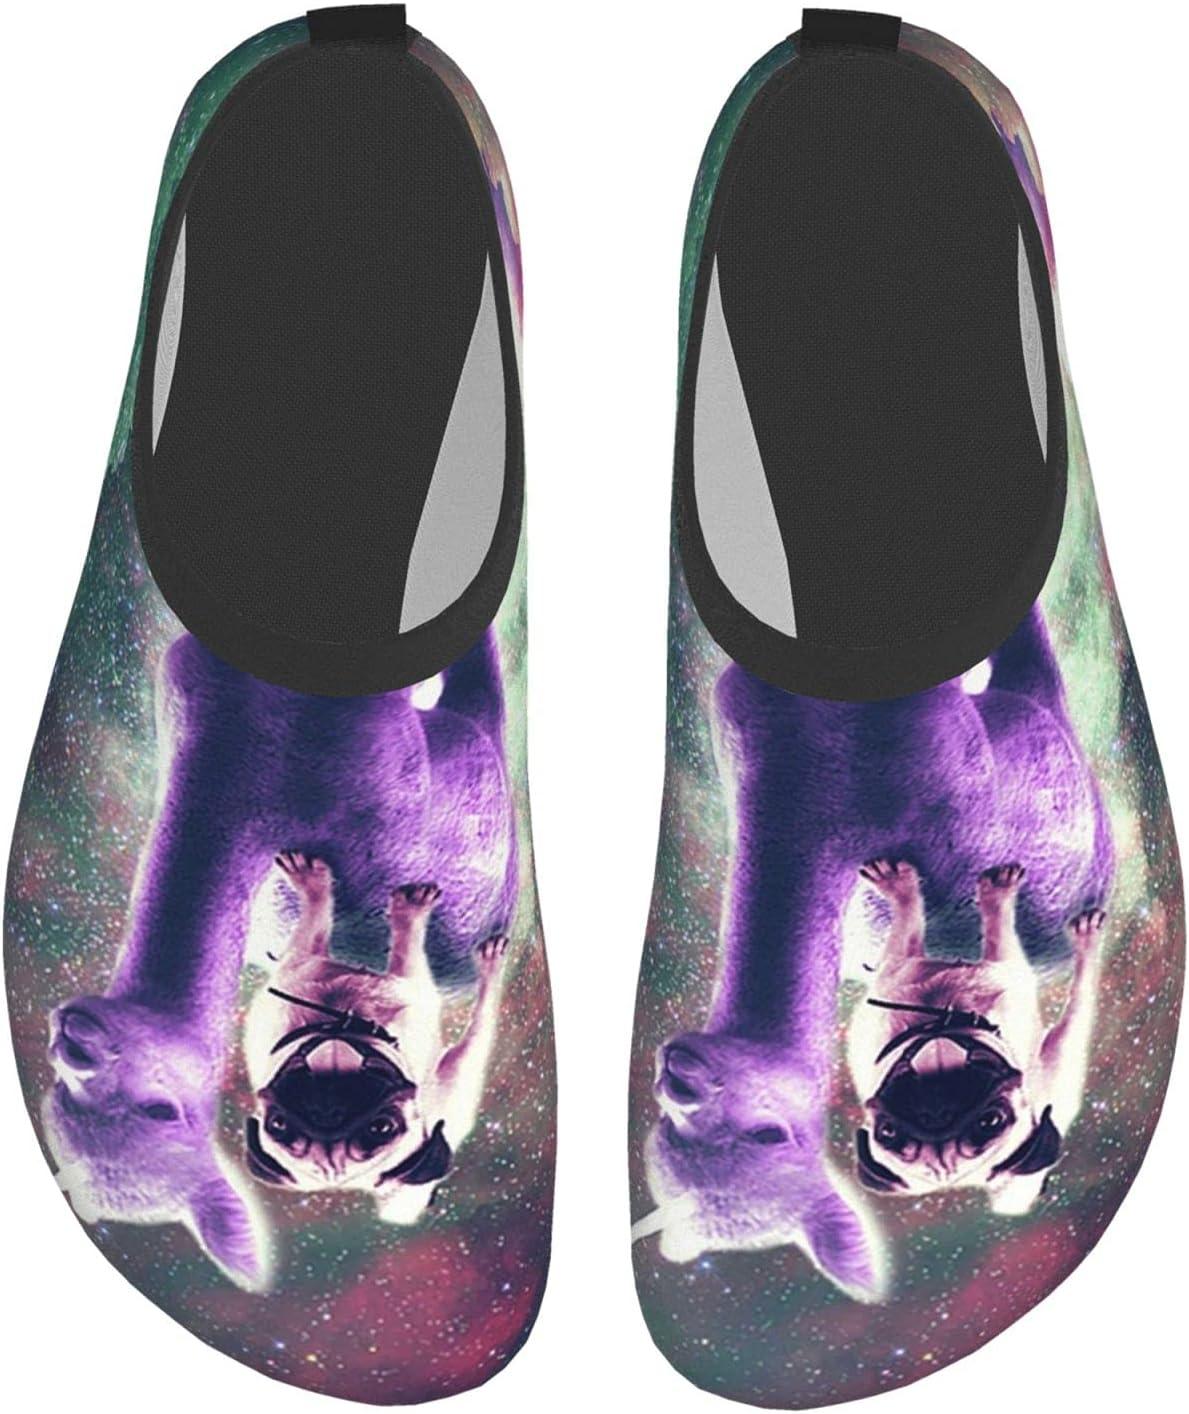 Womens Mens Summer Water Shoes Space Pug Riding Unicorn Llama Funny Dog Barefoot Shoe Quick Dry Aqua Socks